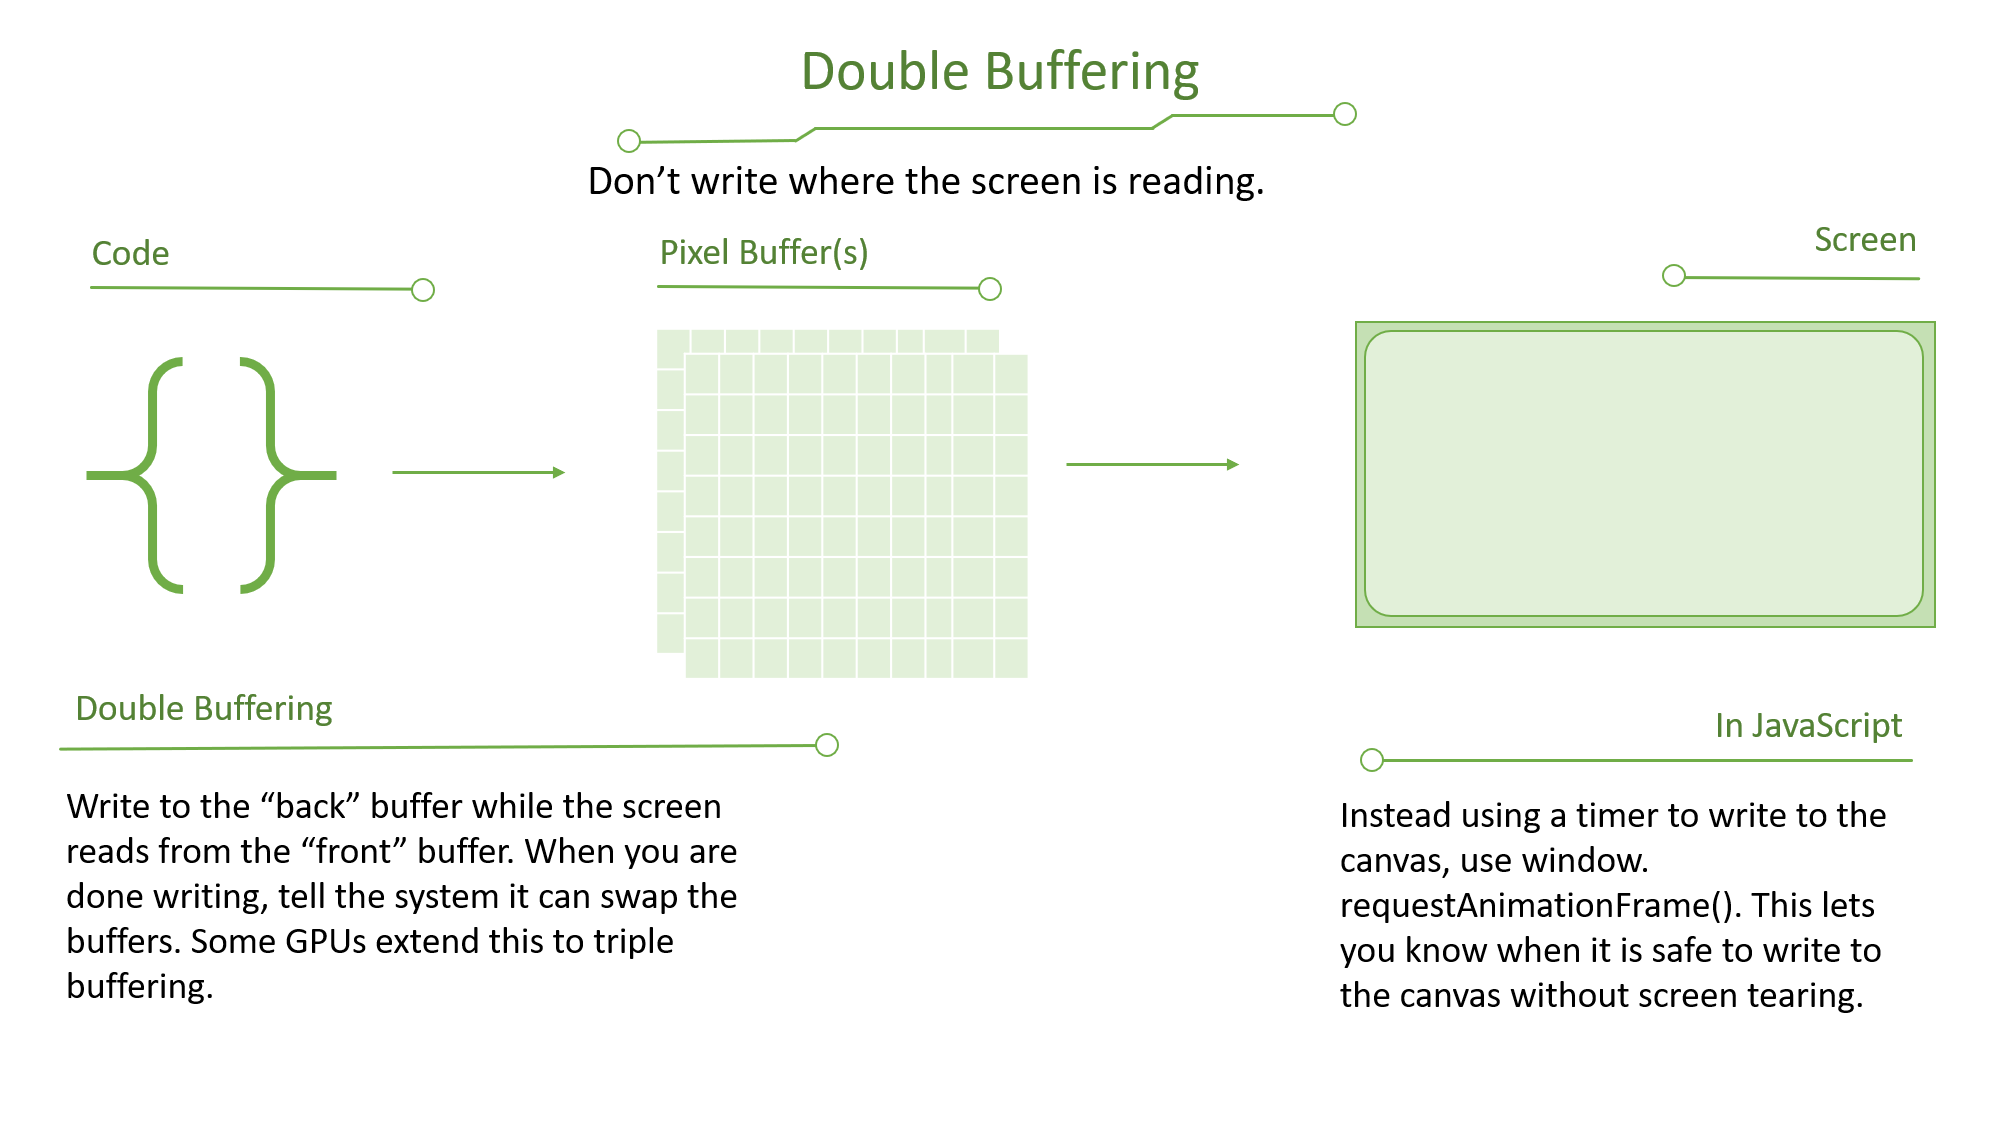 DoubleBuffering